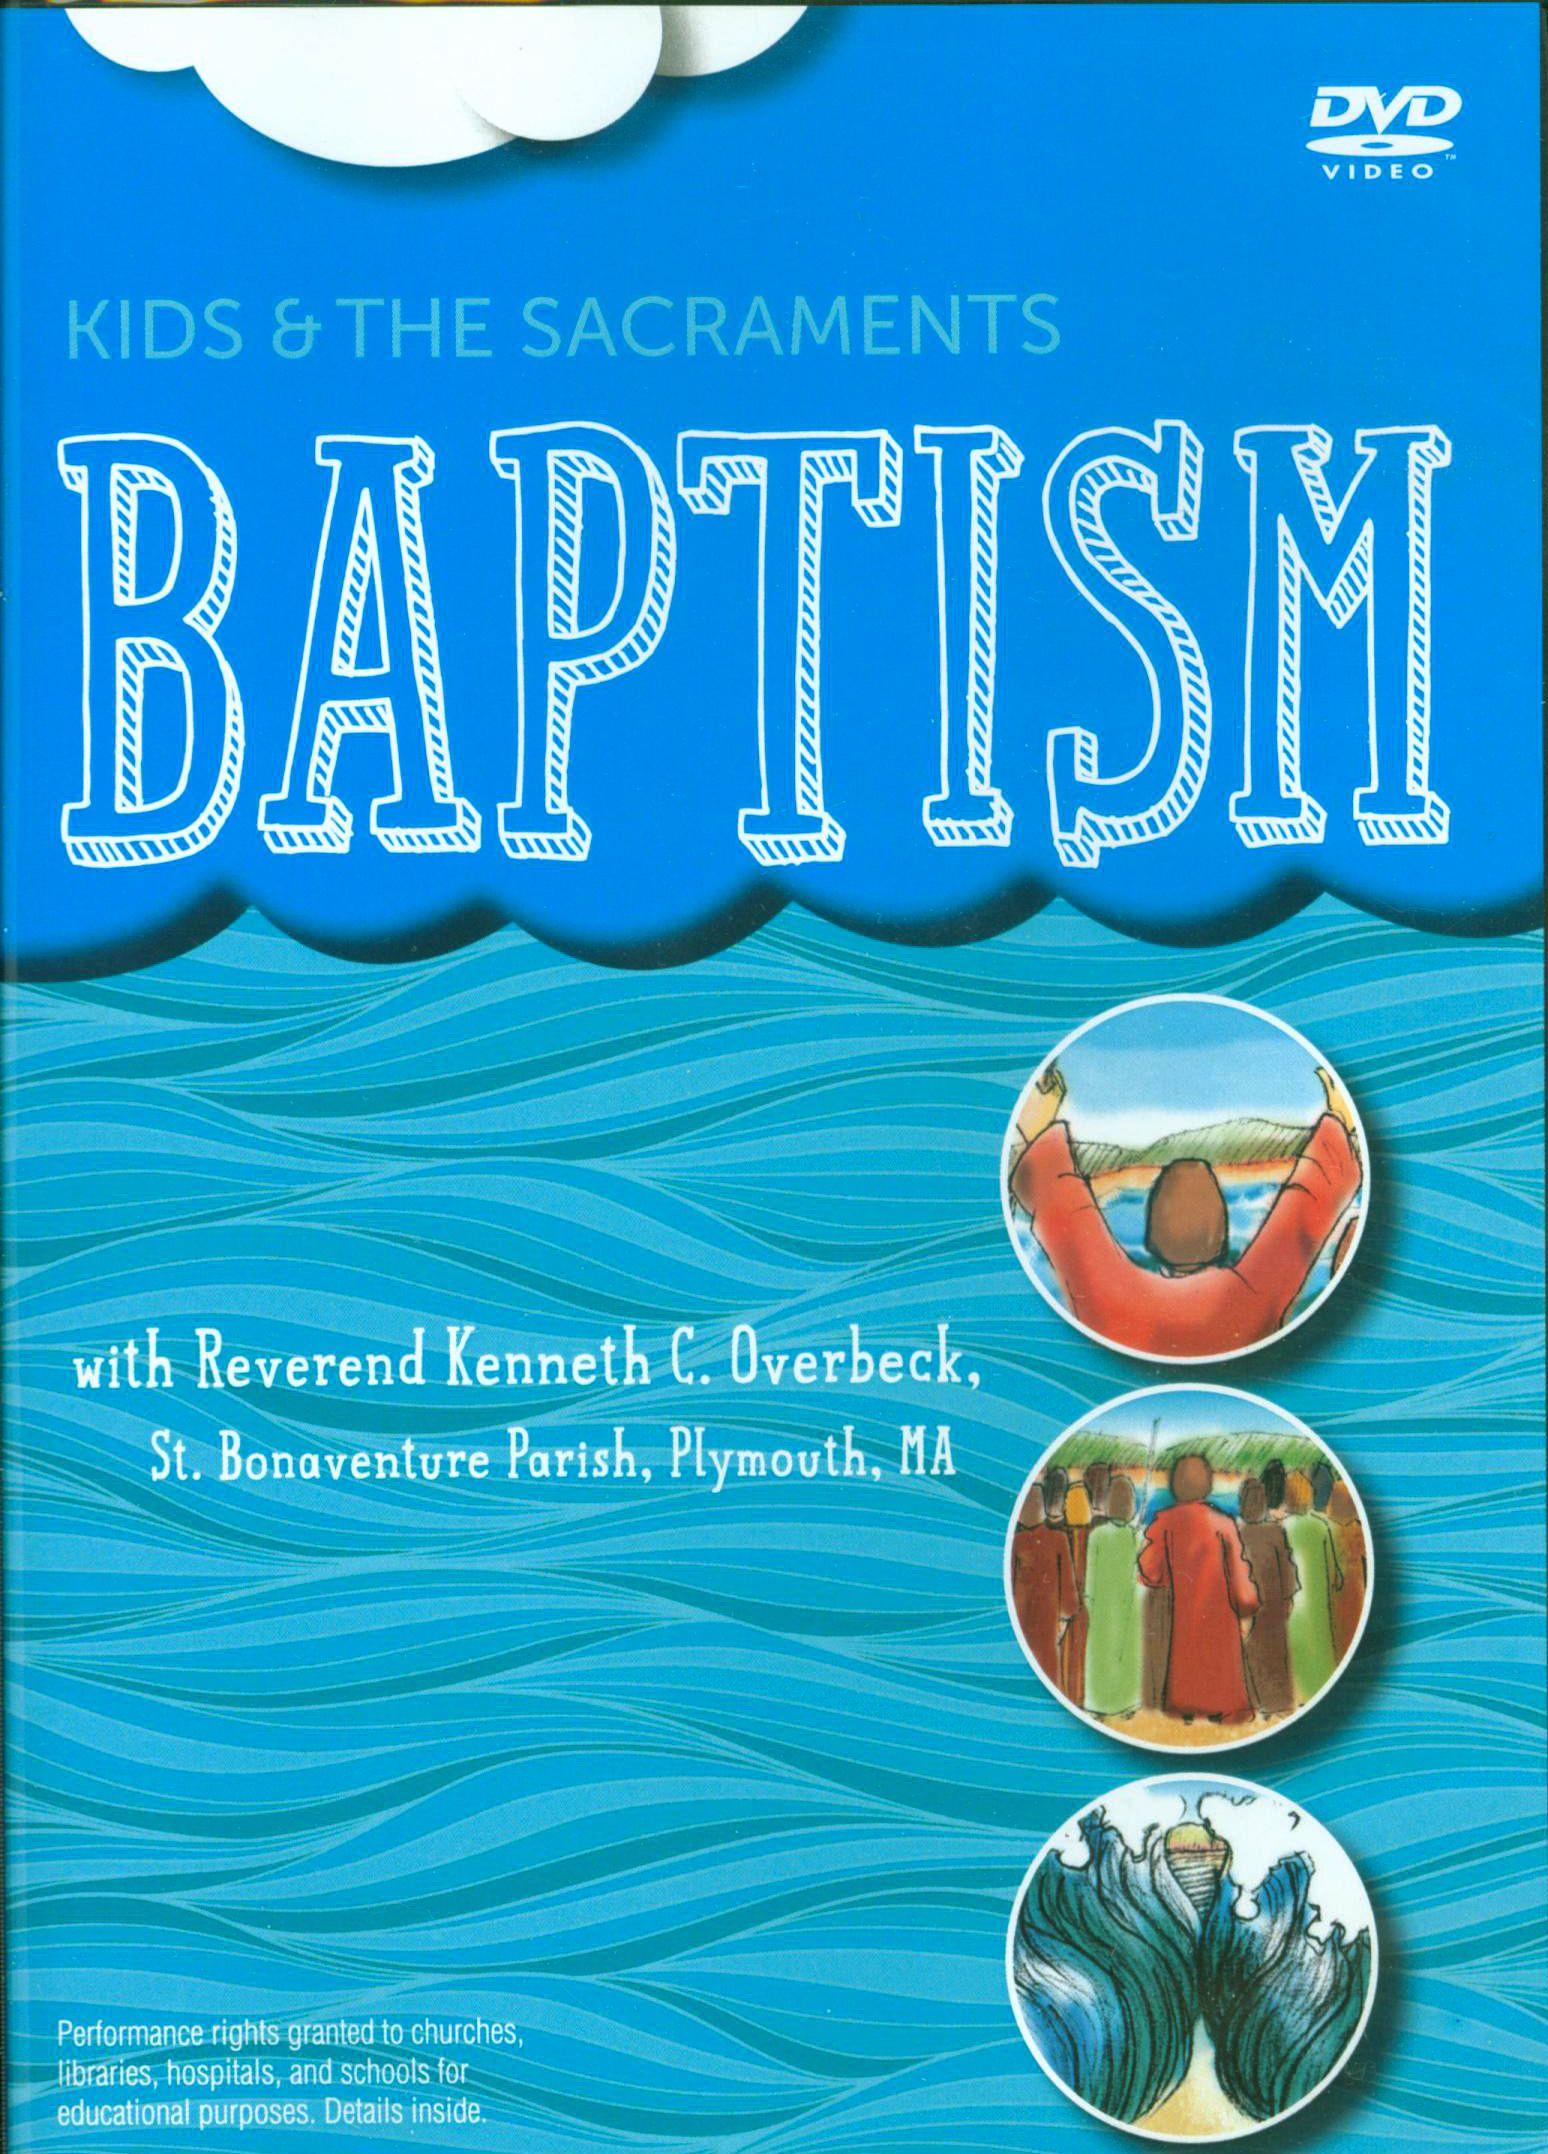 Kids Amp The Sacraments Baptism Dvd